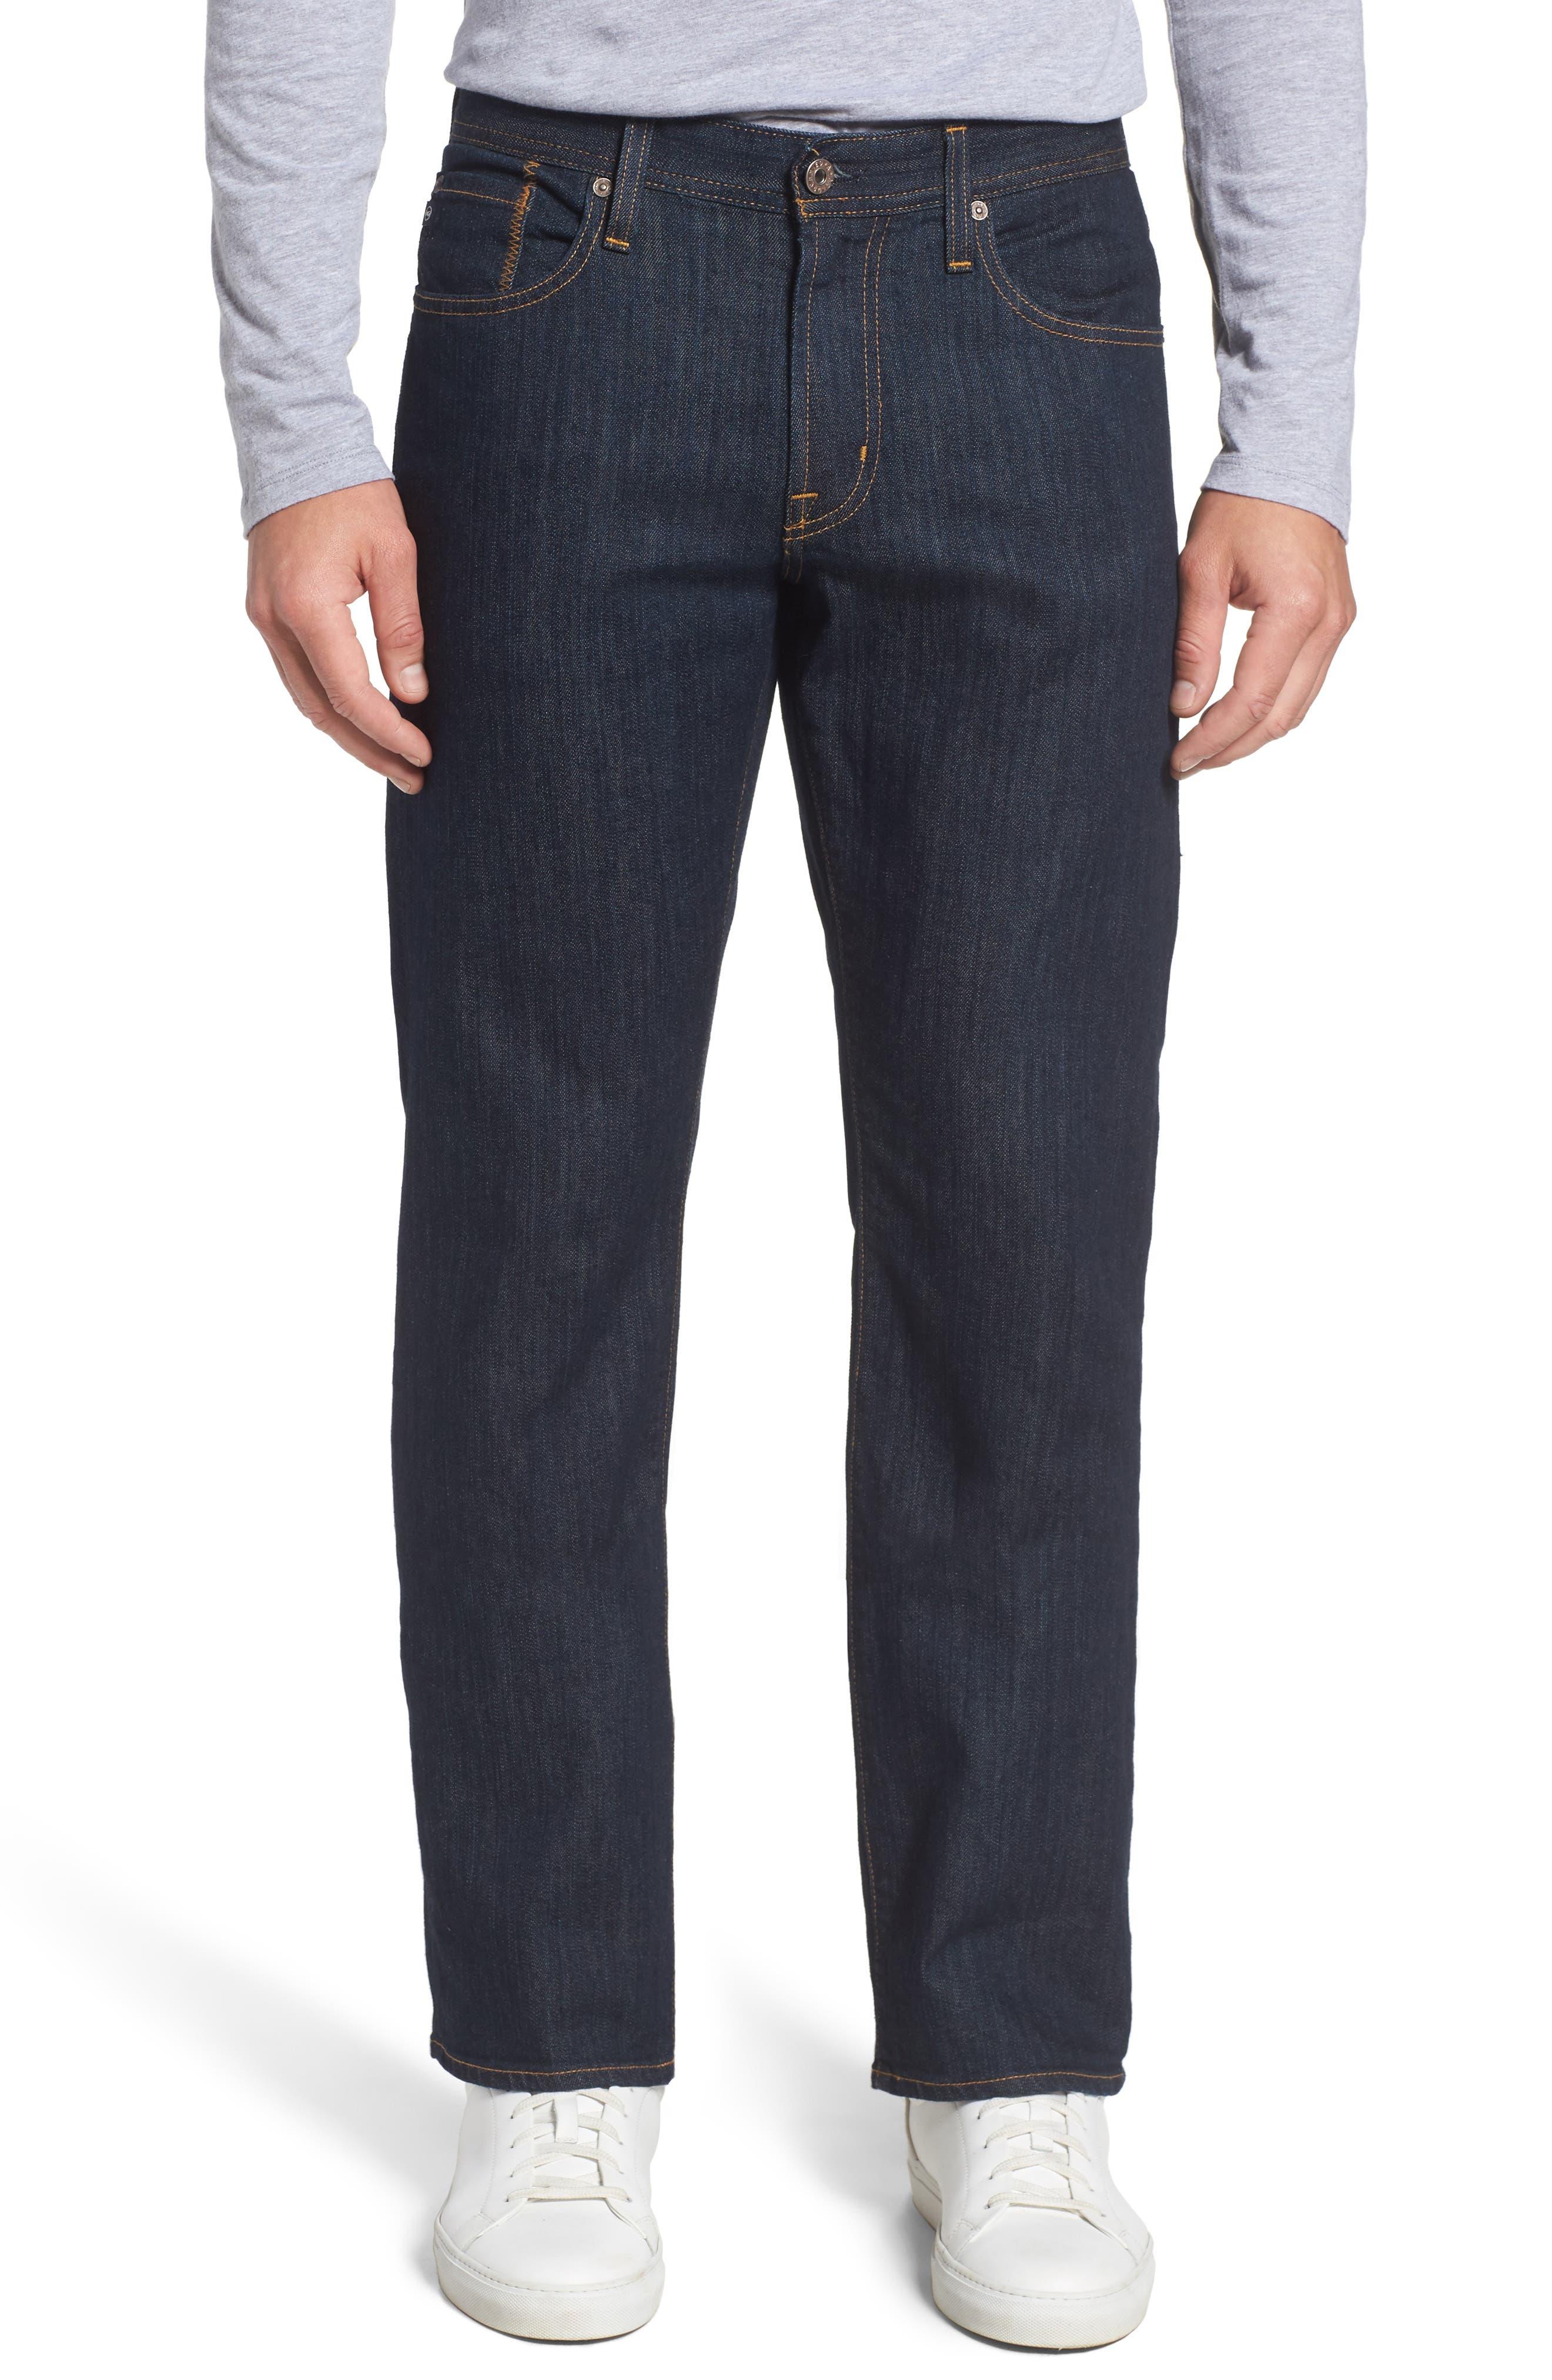 'Protégé' Straight Leg Jeans,                         Main,                         color, Blake